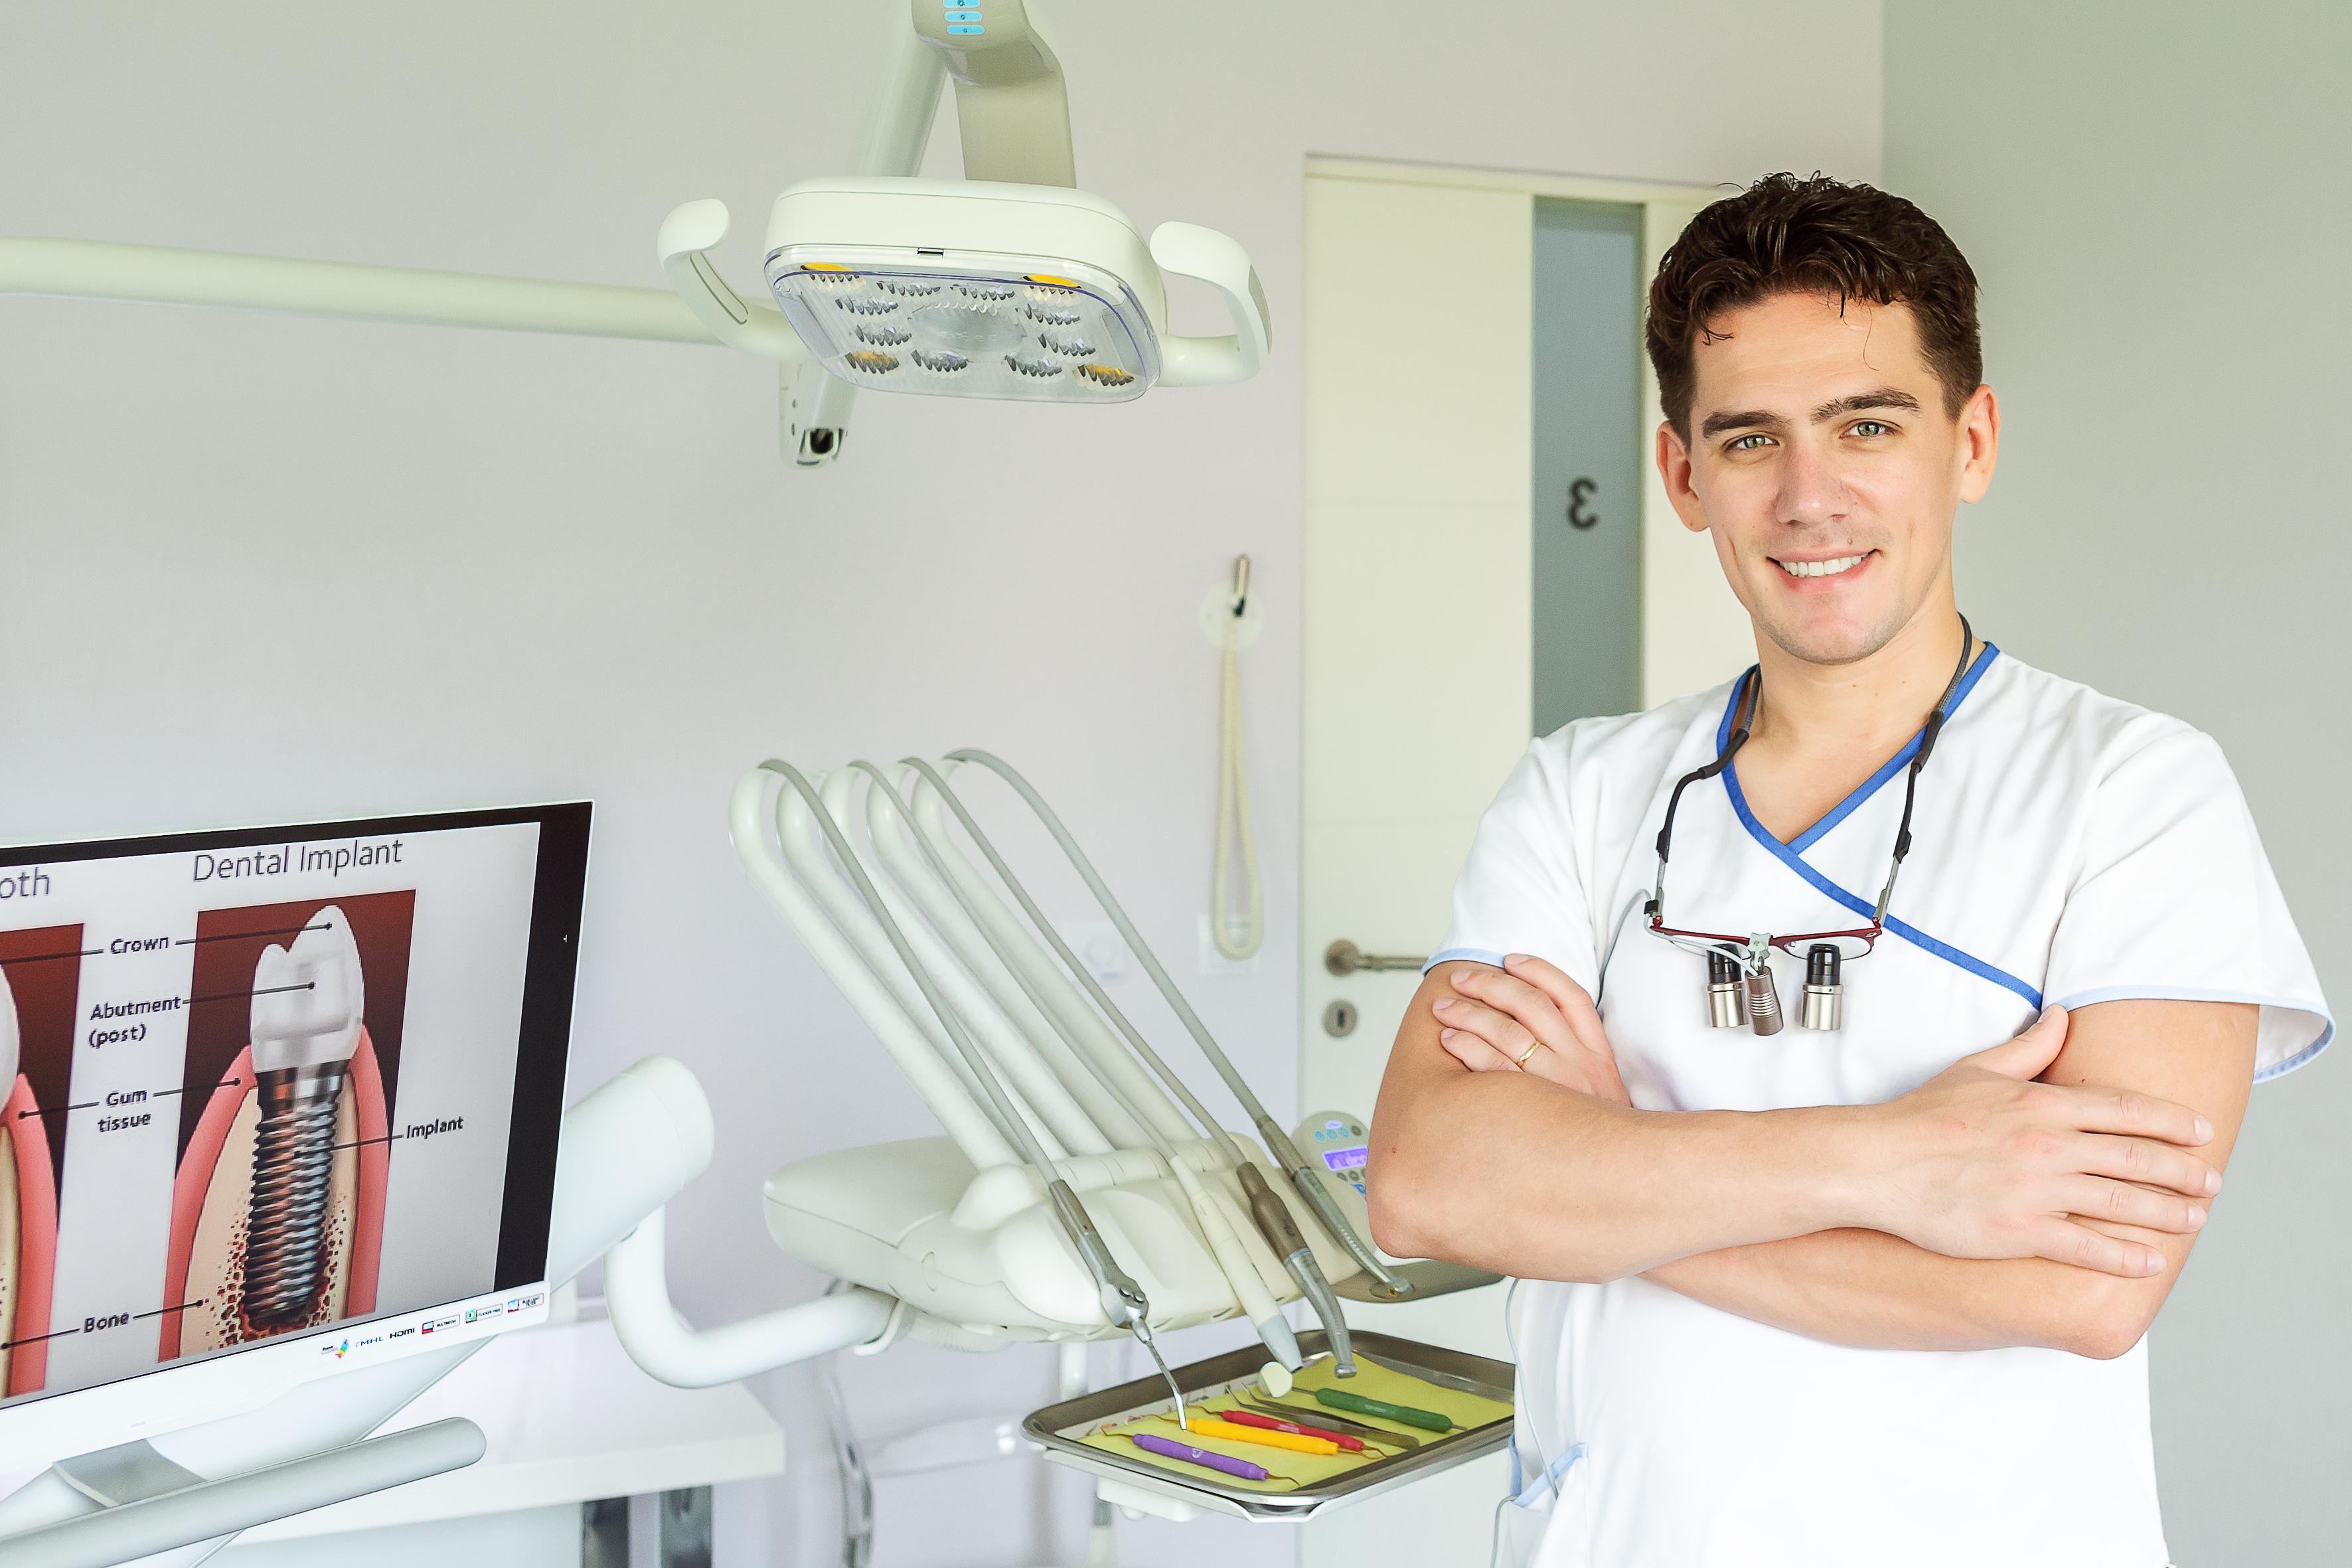 hambaarst I